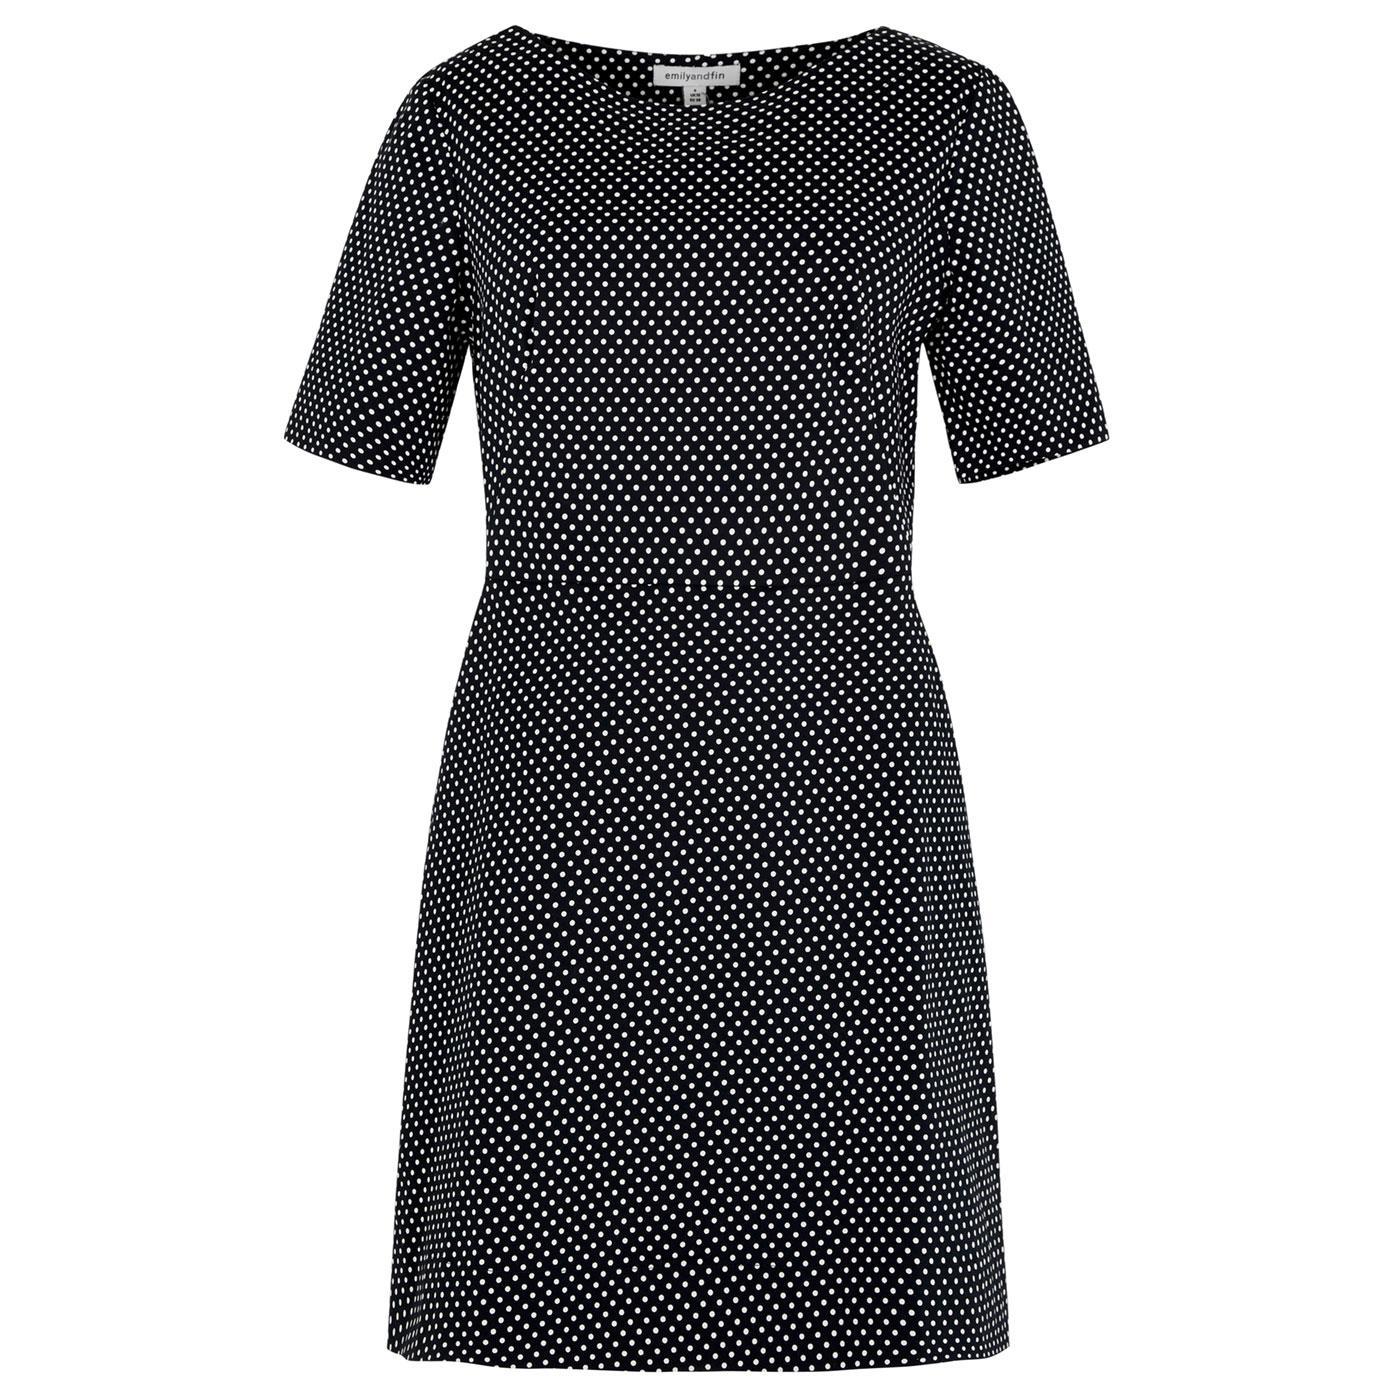 Aggie EMILY & FIN Retro Mini Polkadot Spot Dress